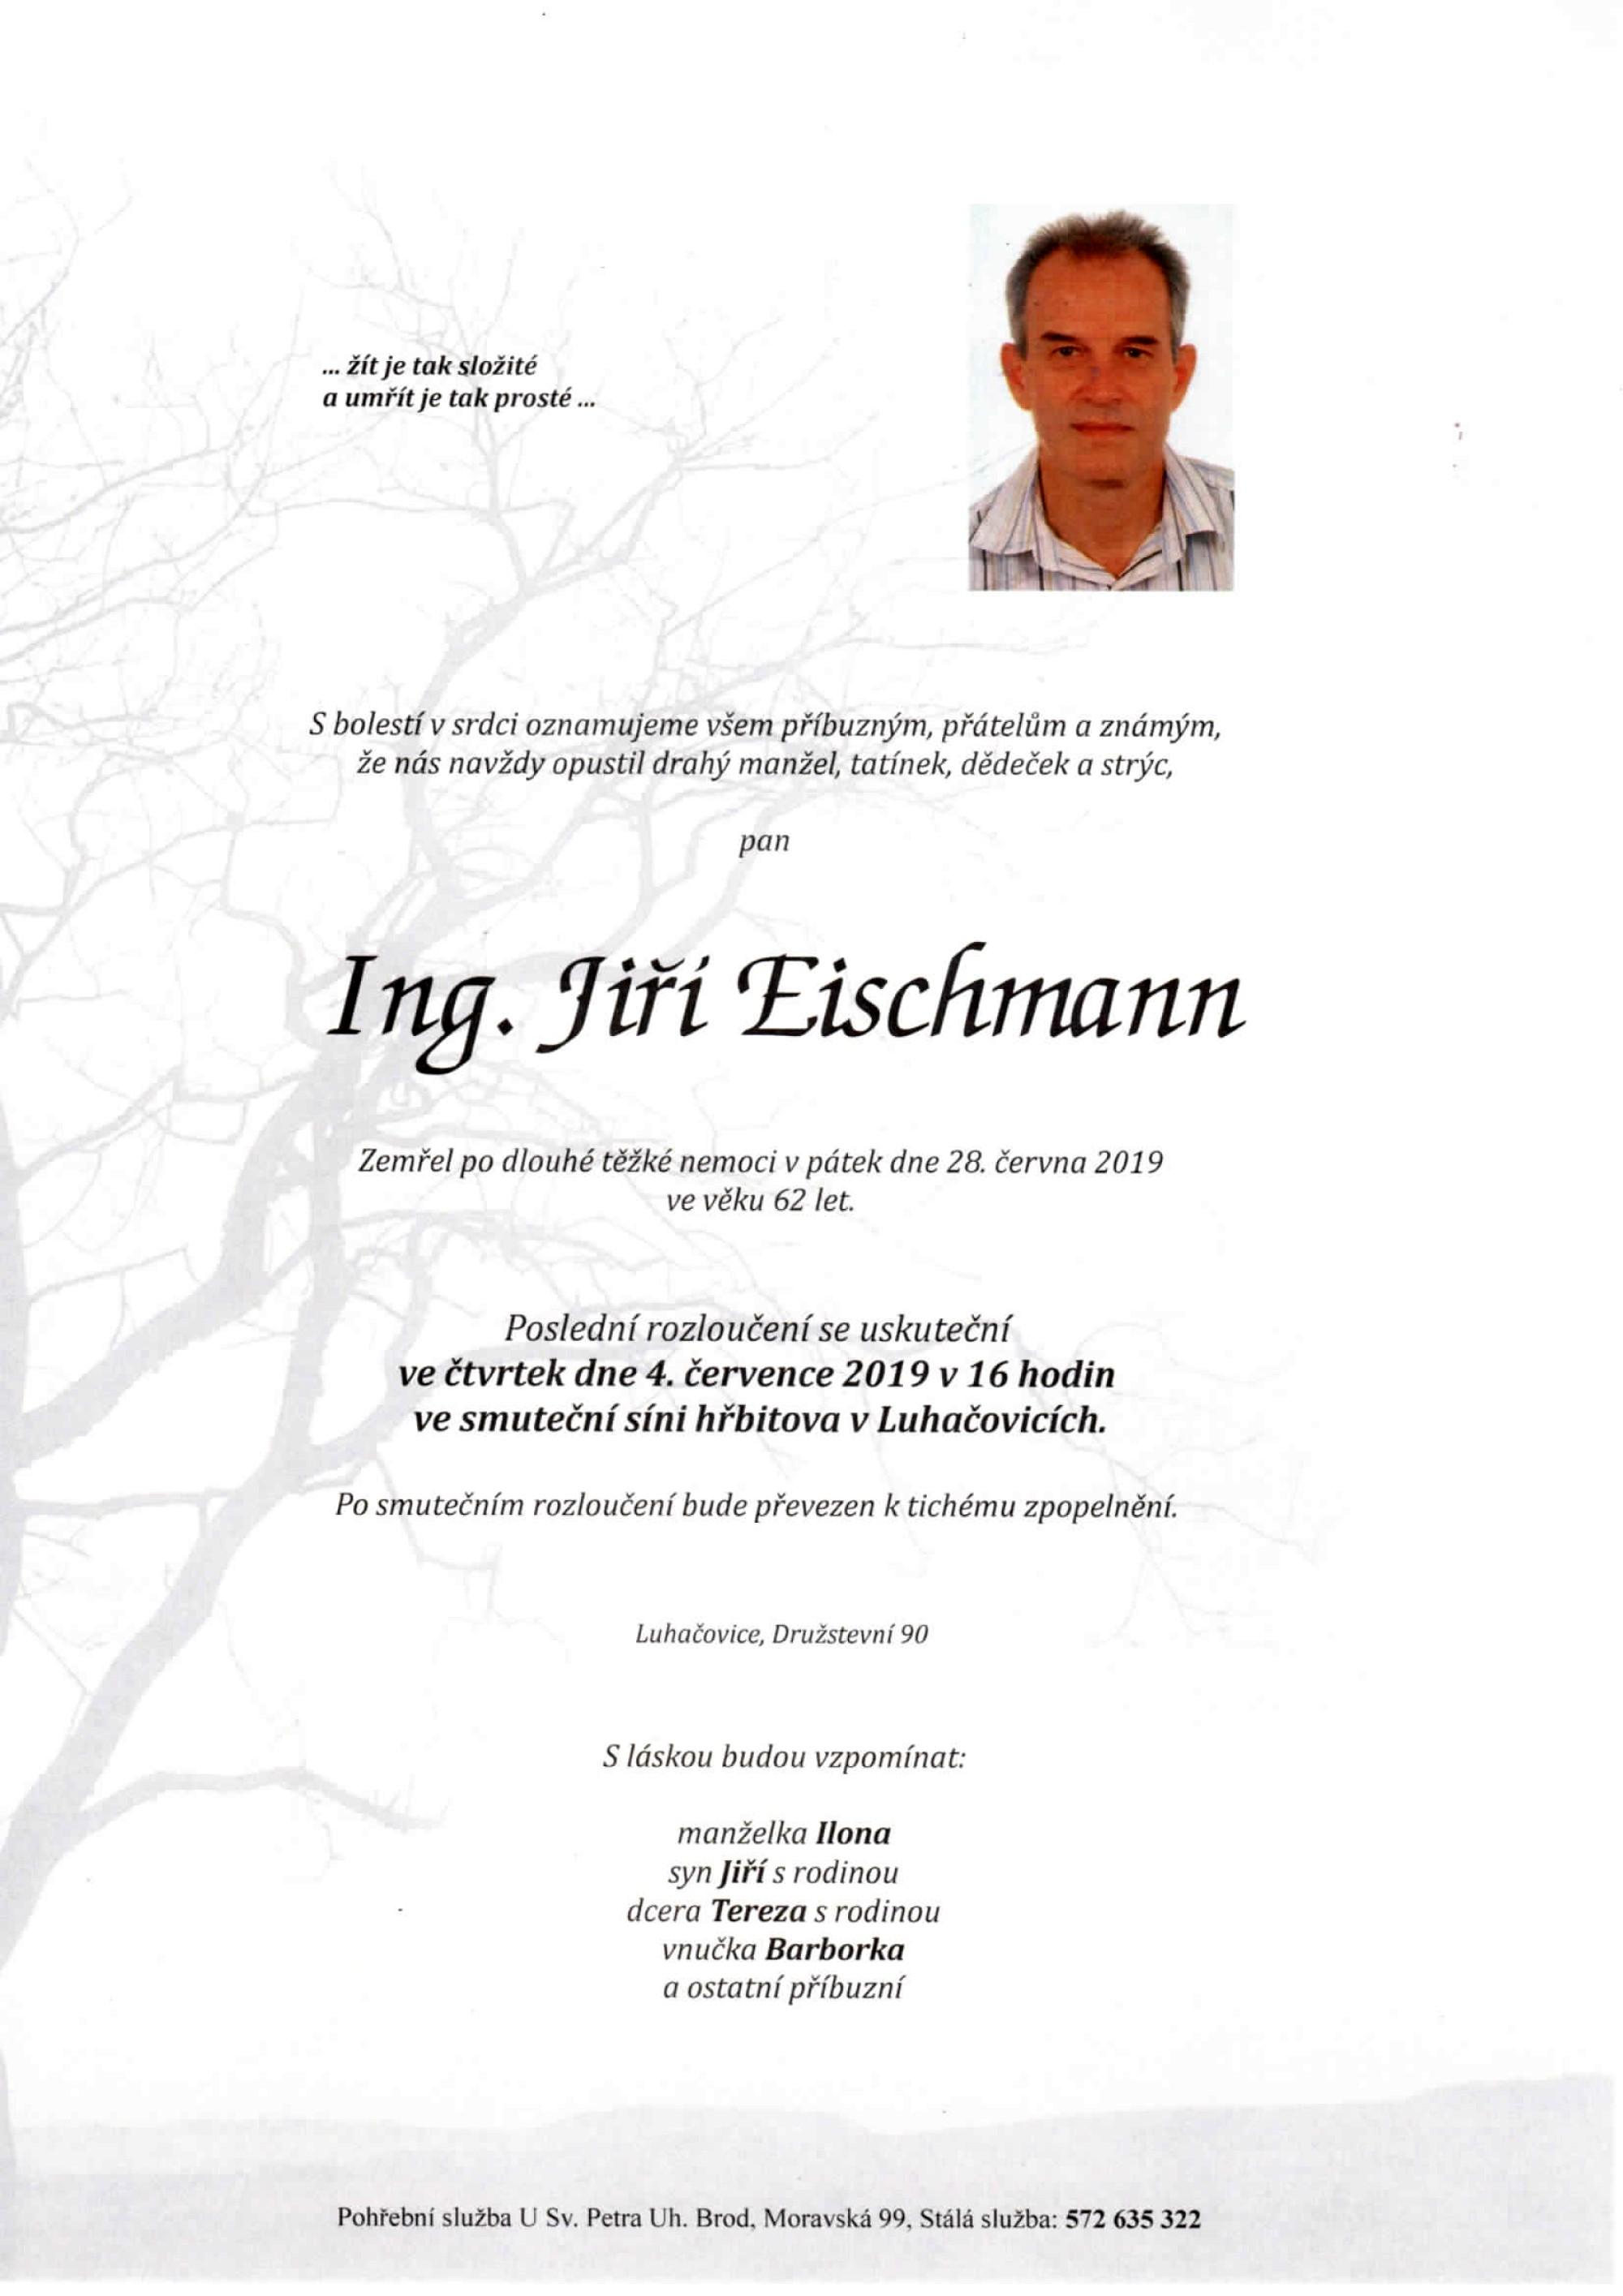 Ing. Jiří Eischmann